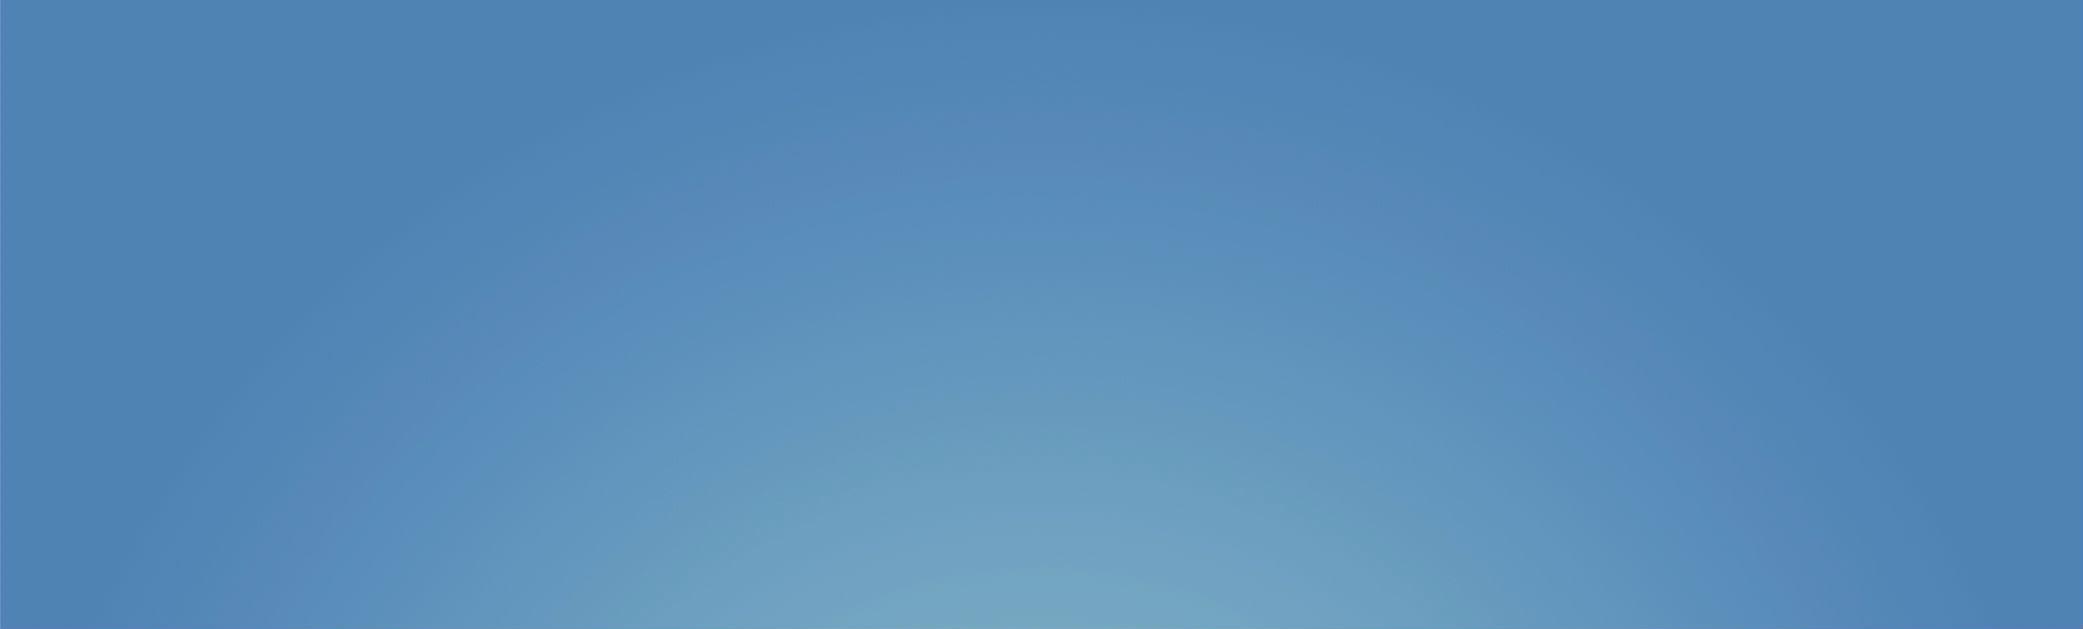 Blue_Bar_Horizontal_.png